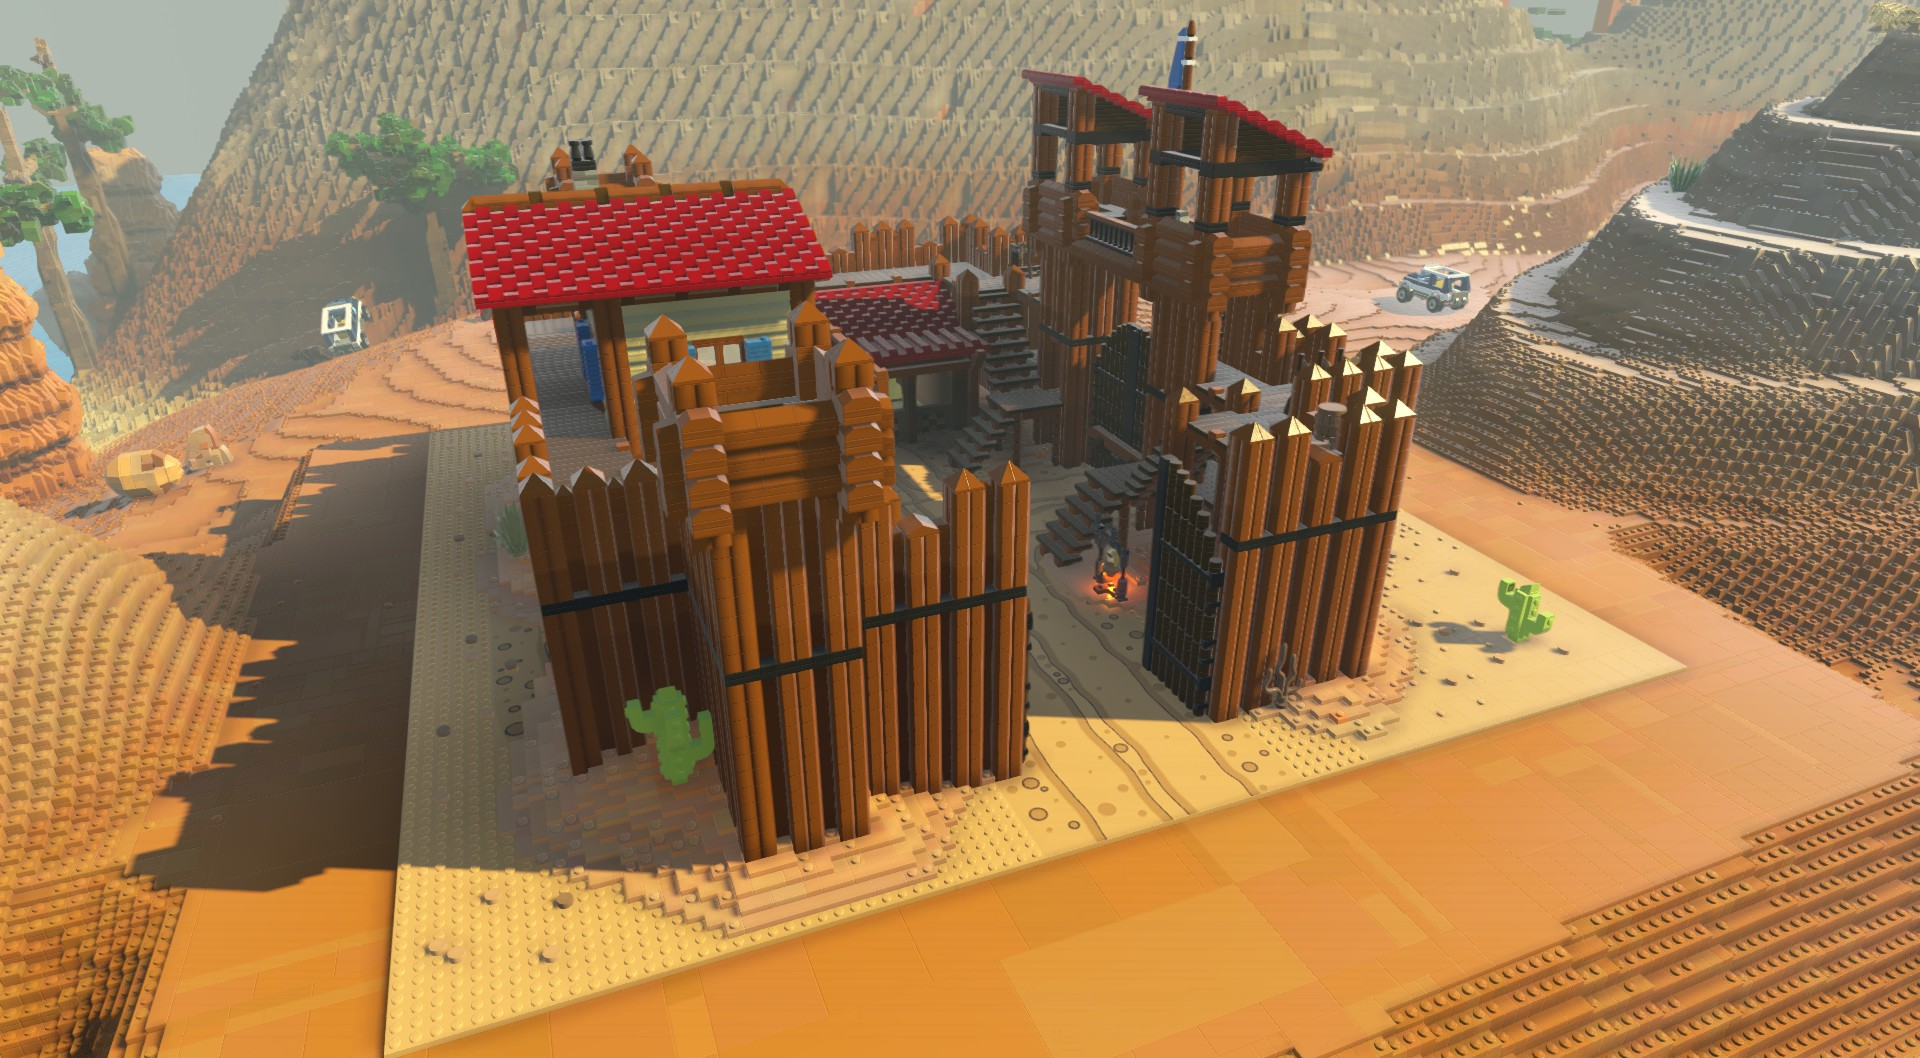 Western Fort Lego Worlds Wiki Fandom